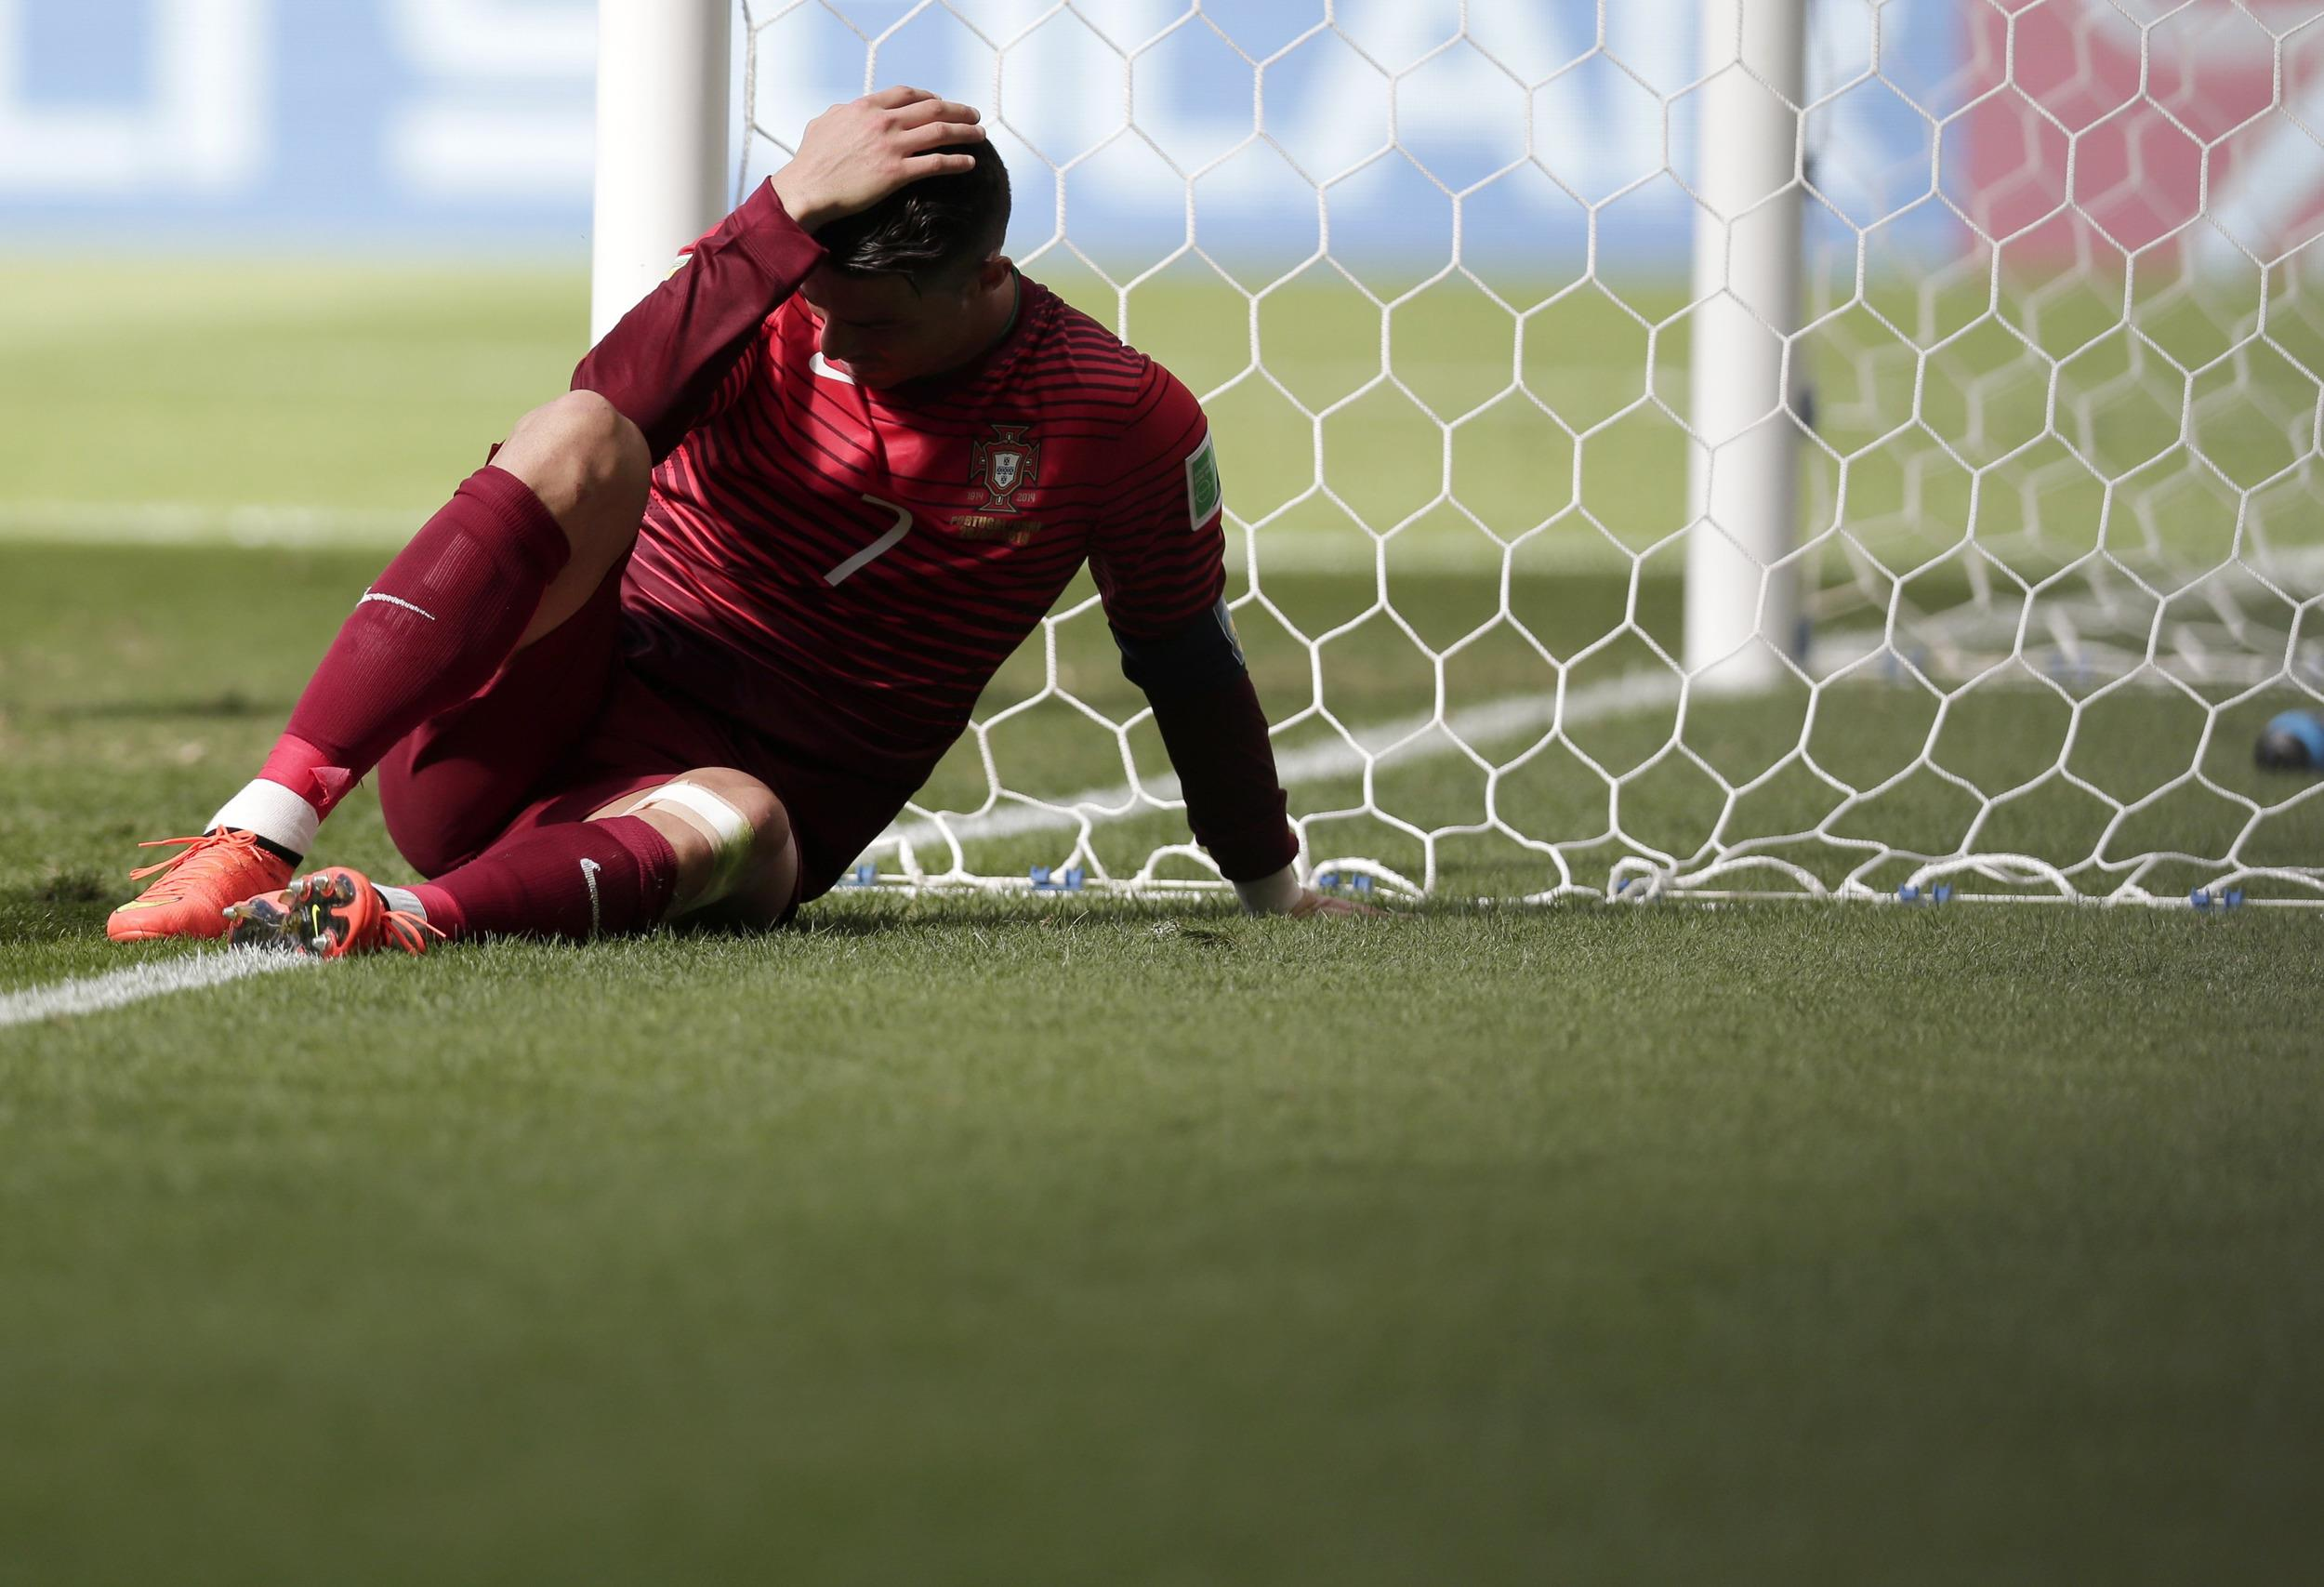 Image: Cristiano Ronaldo